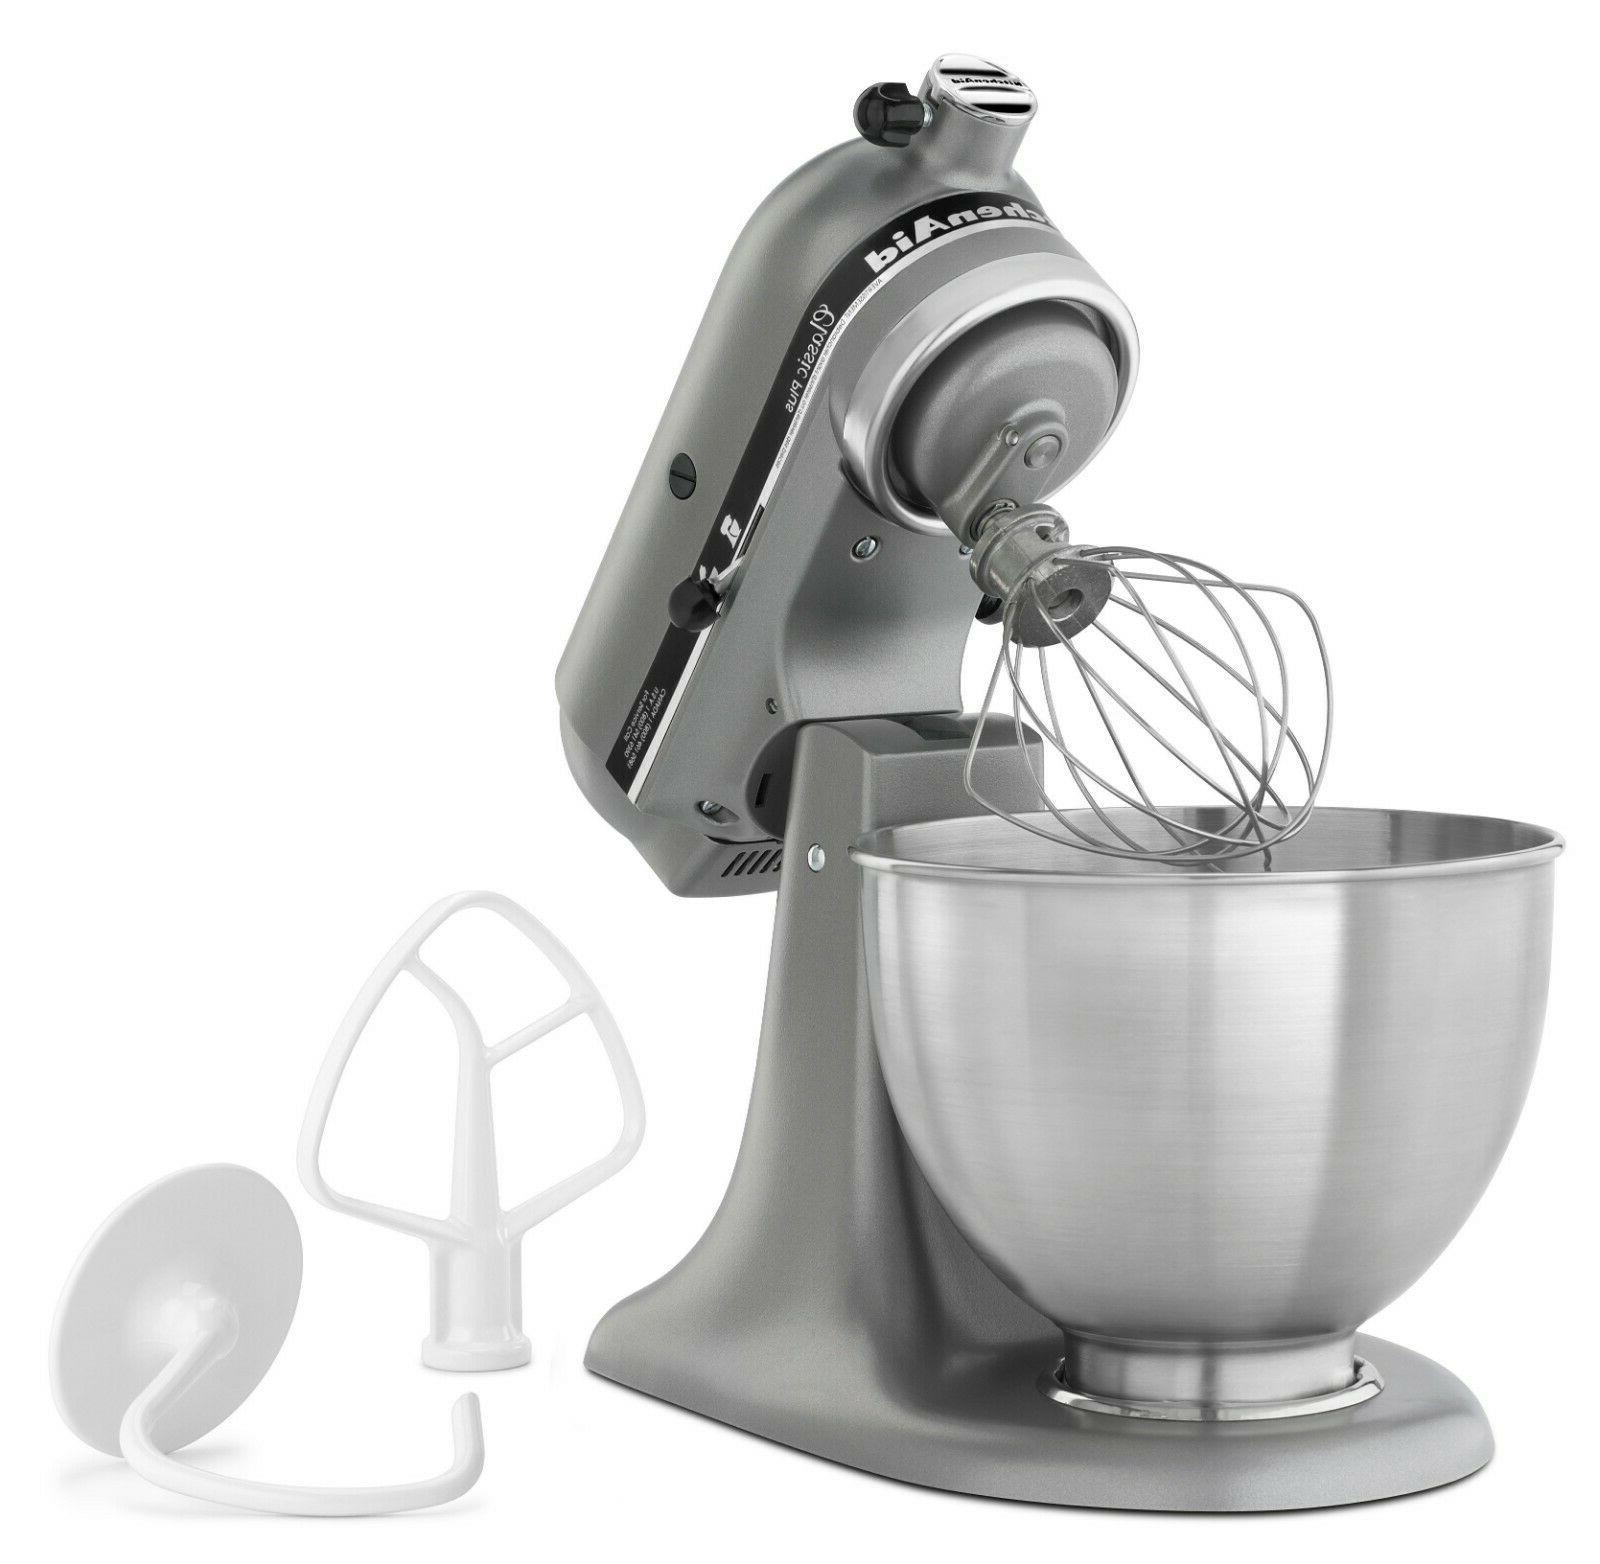 KitchenAid® Classic Plus™ Series 4.5 Quart Tilt-Head Stand Mixer -